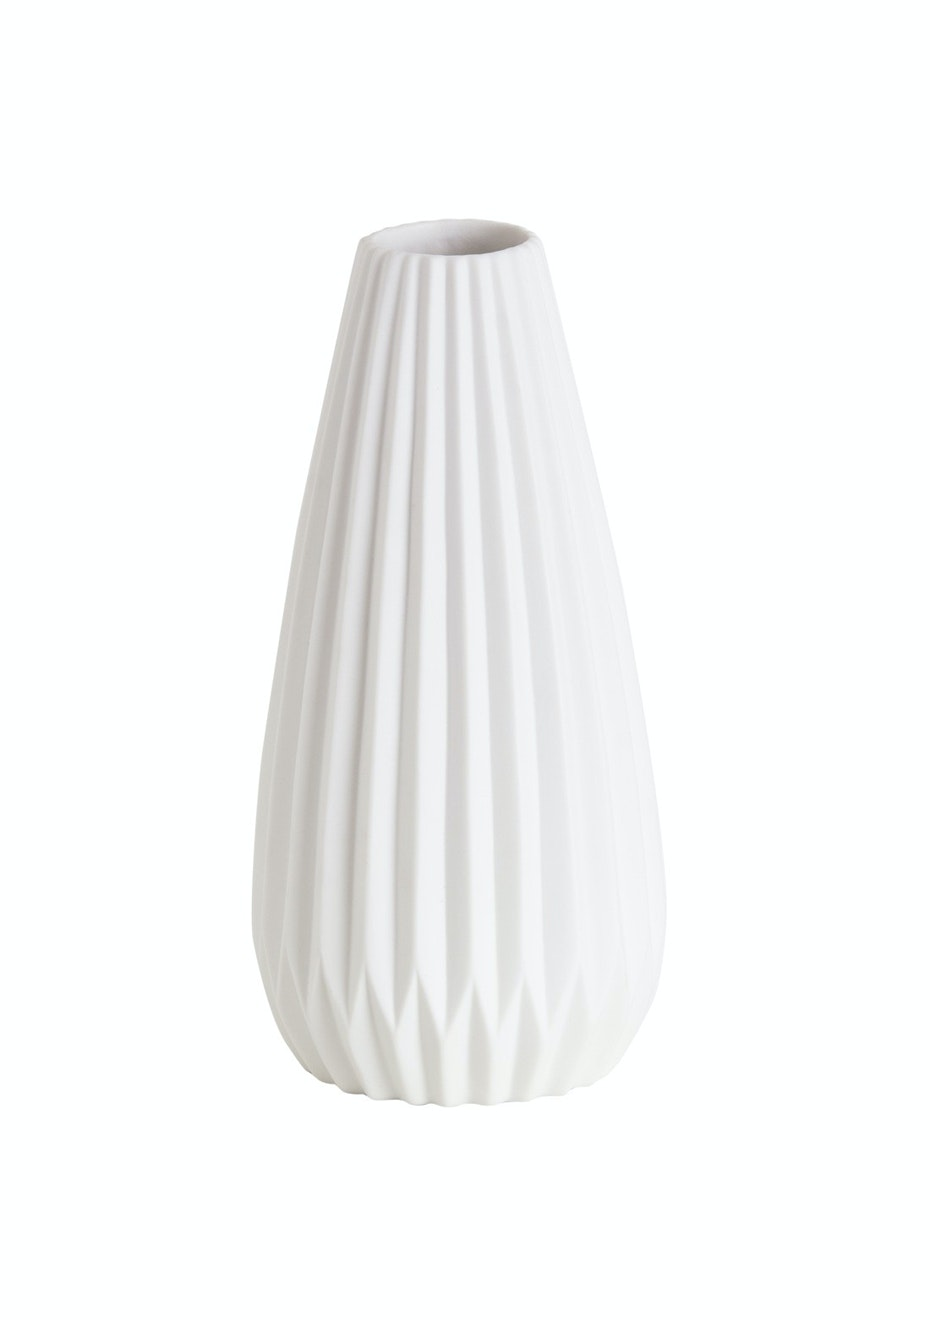 Jason - Sculptural Lines Vase